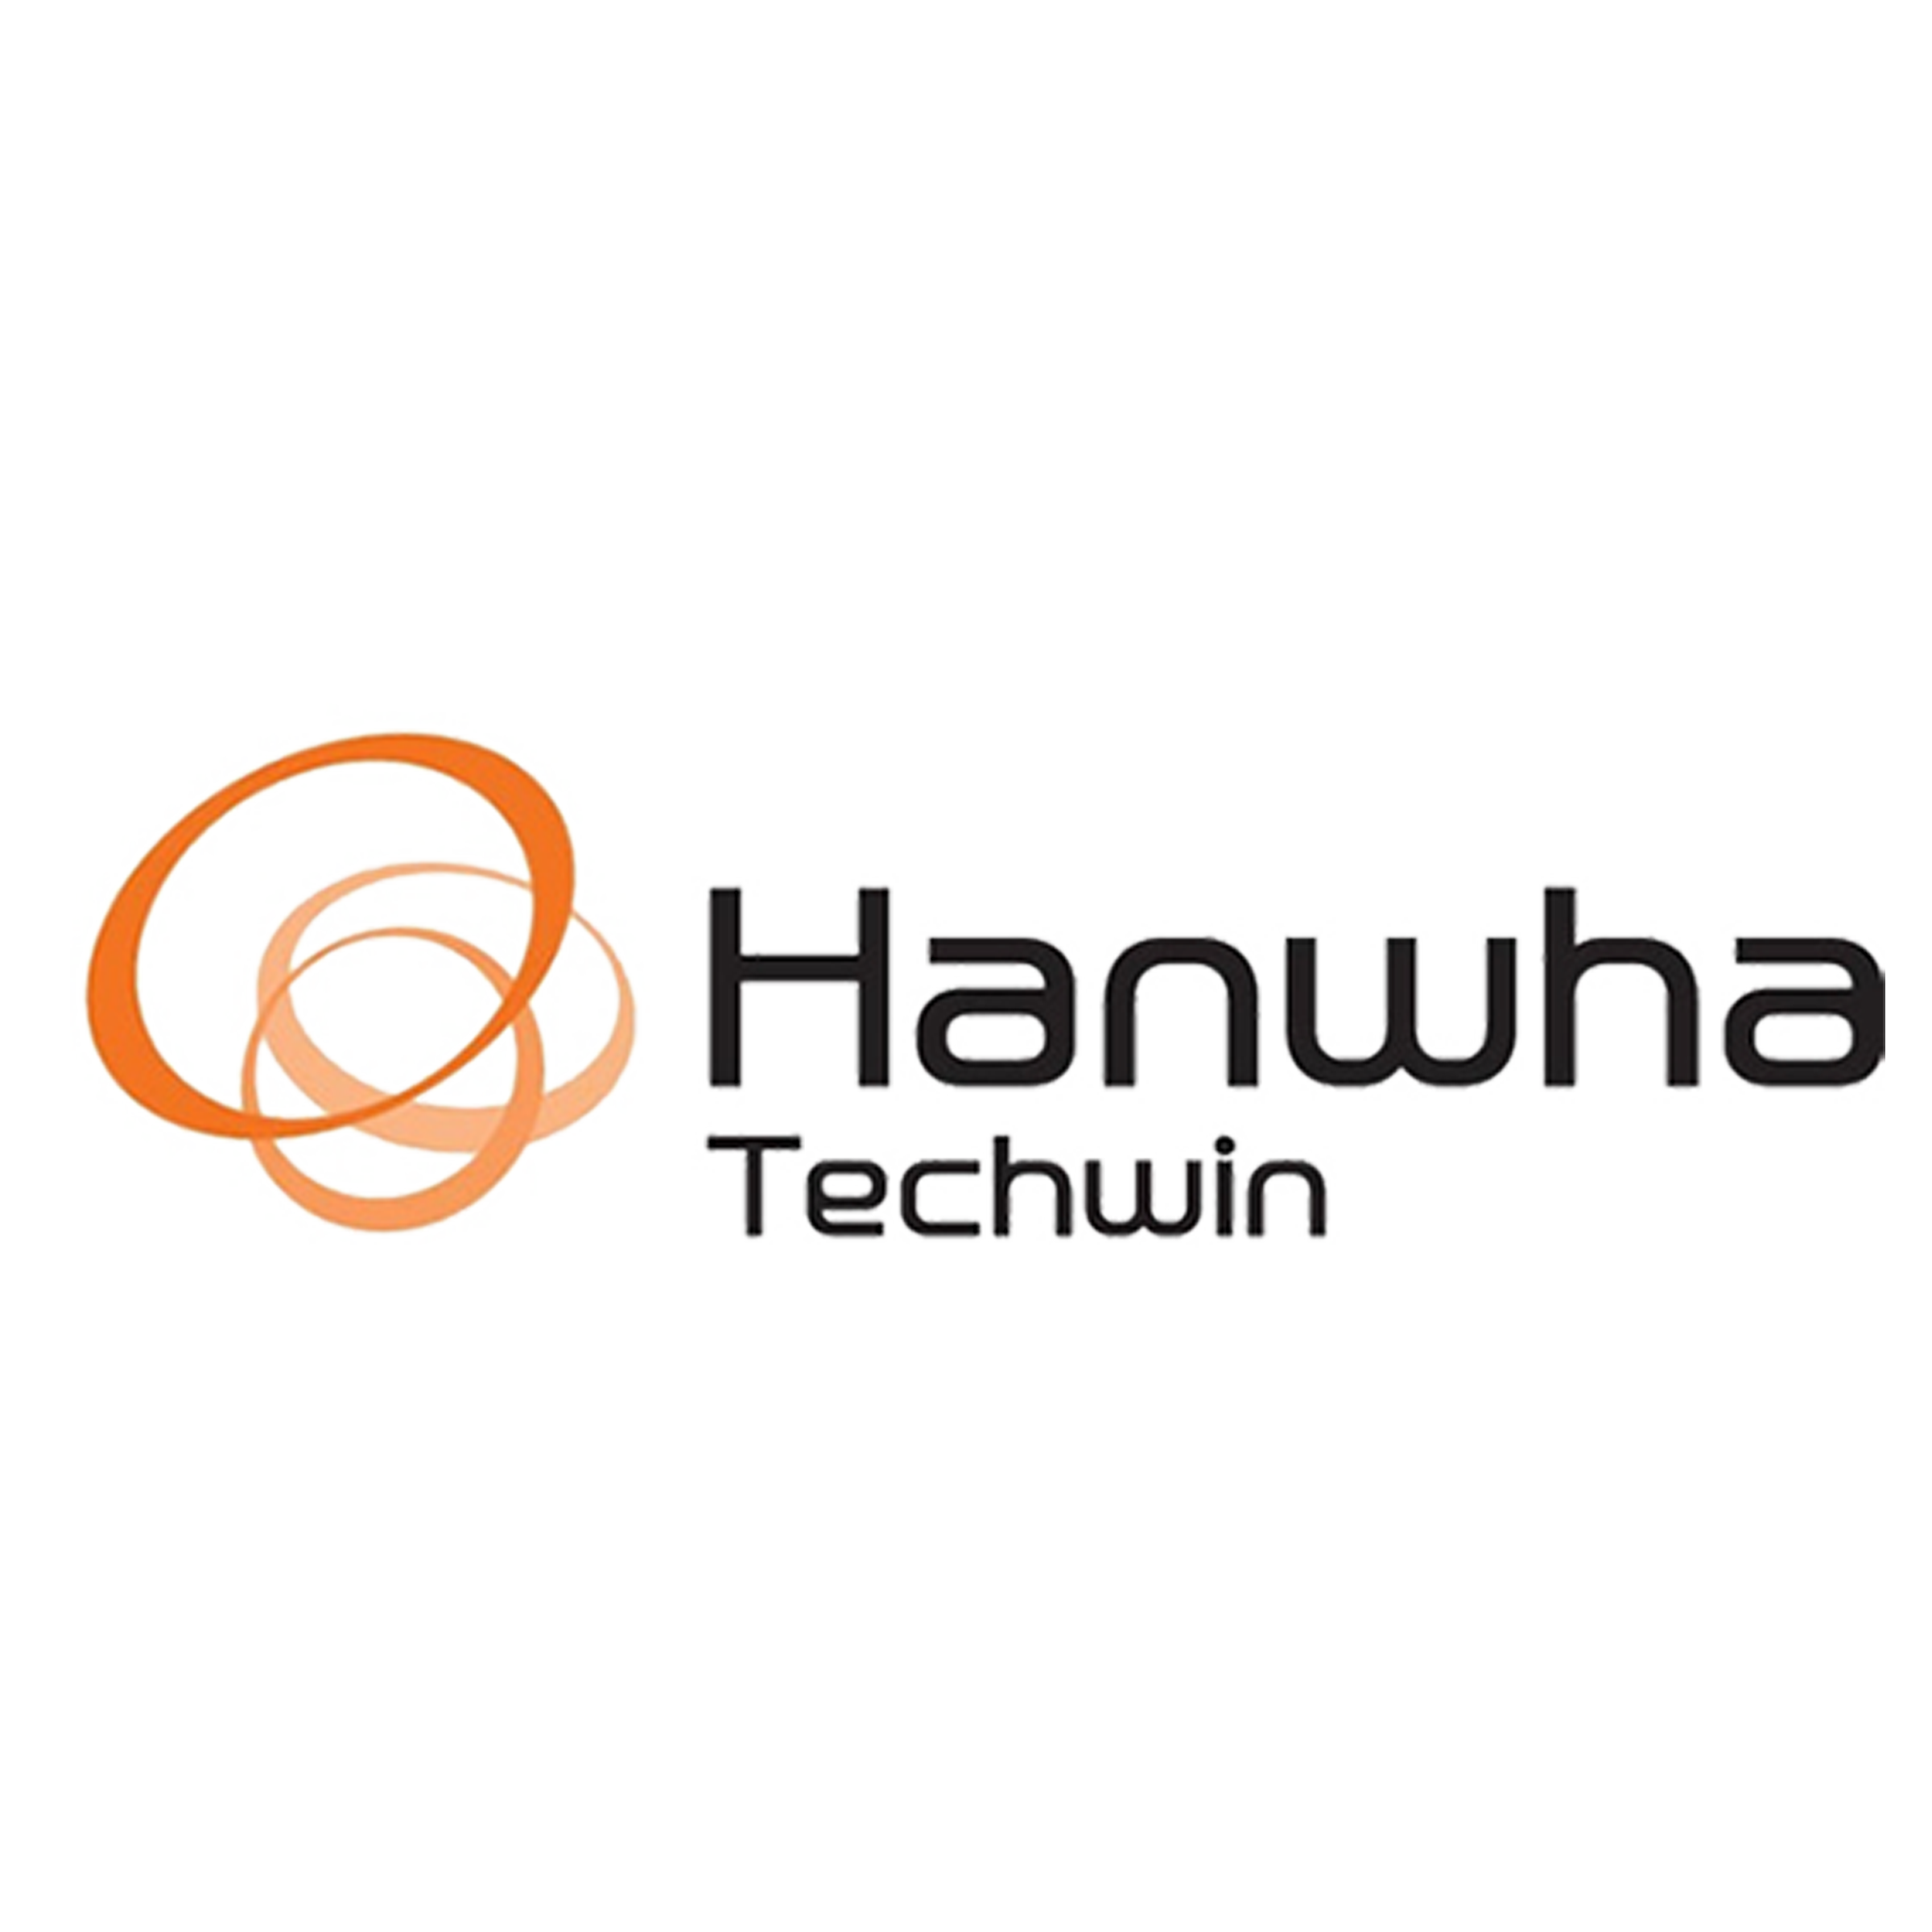 3hanwha-techwin-logo